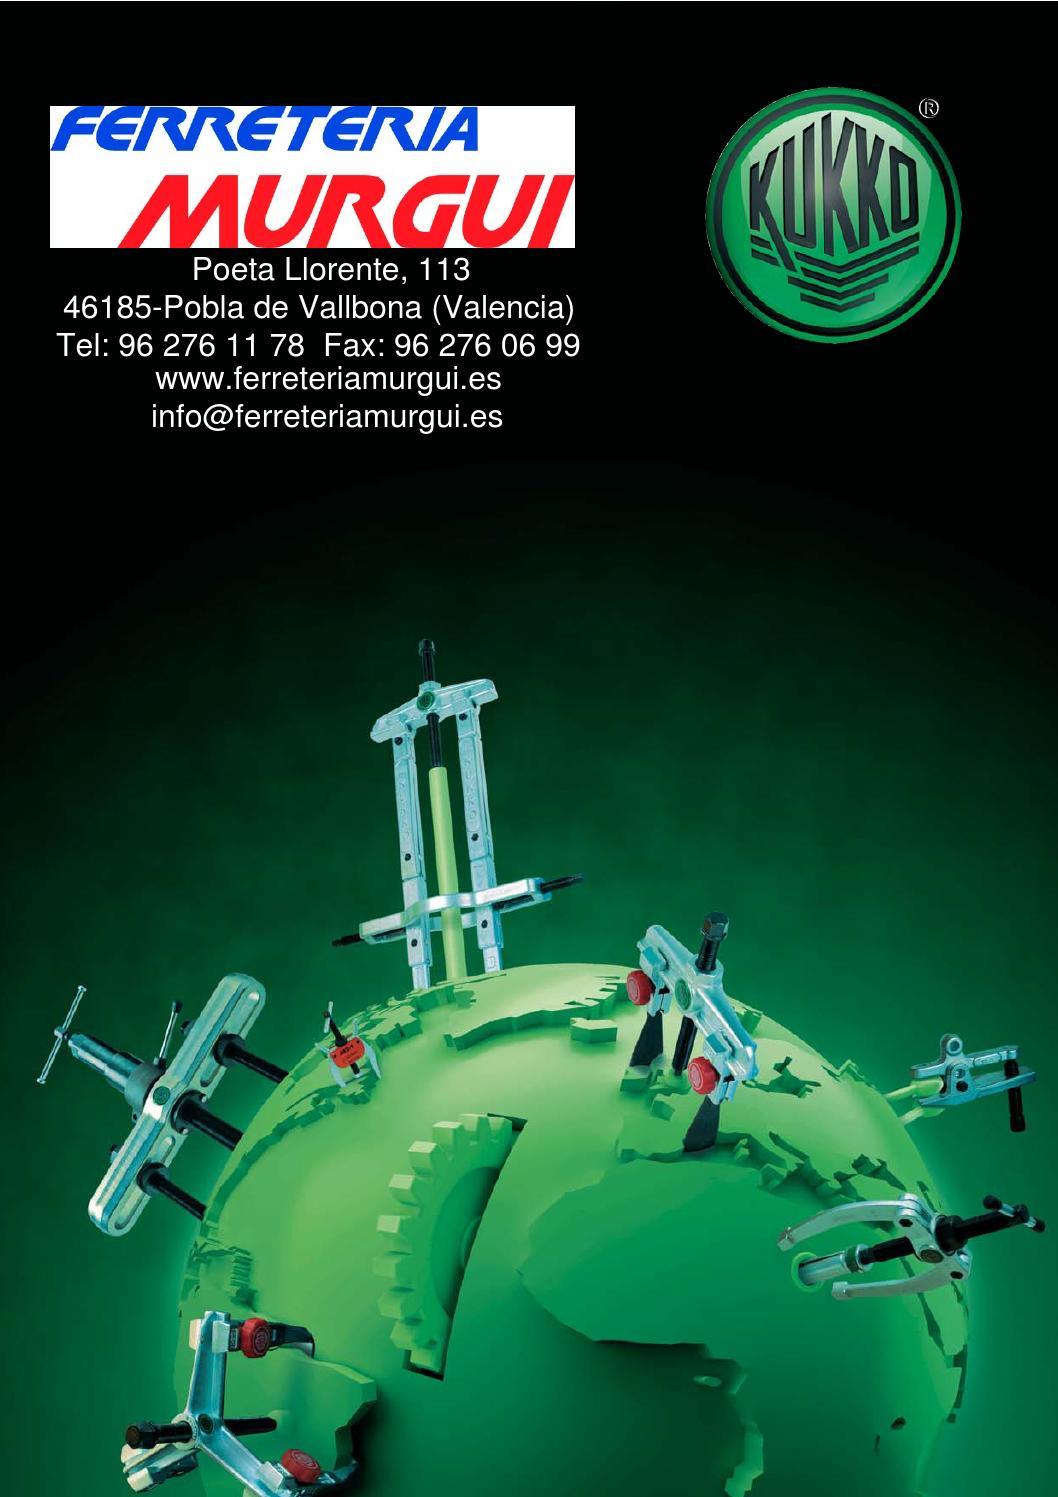 Kukko 201-0 Extractor de 2 Patas Reversibles y articuladas 100 x 75 mm